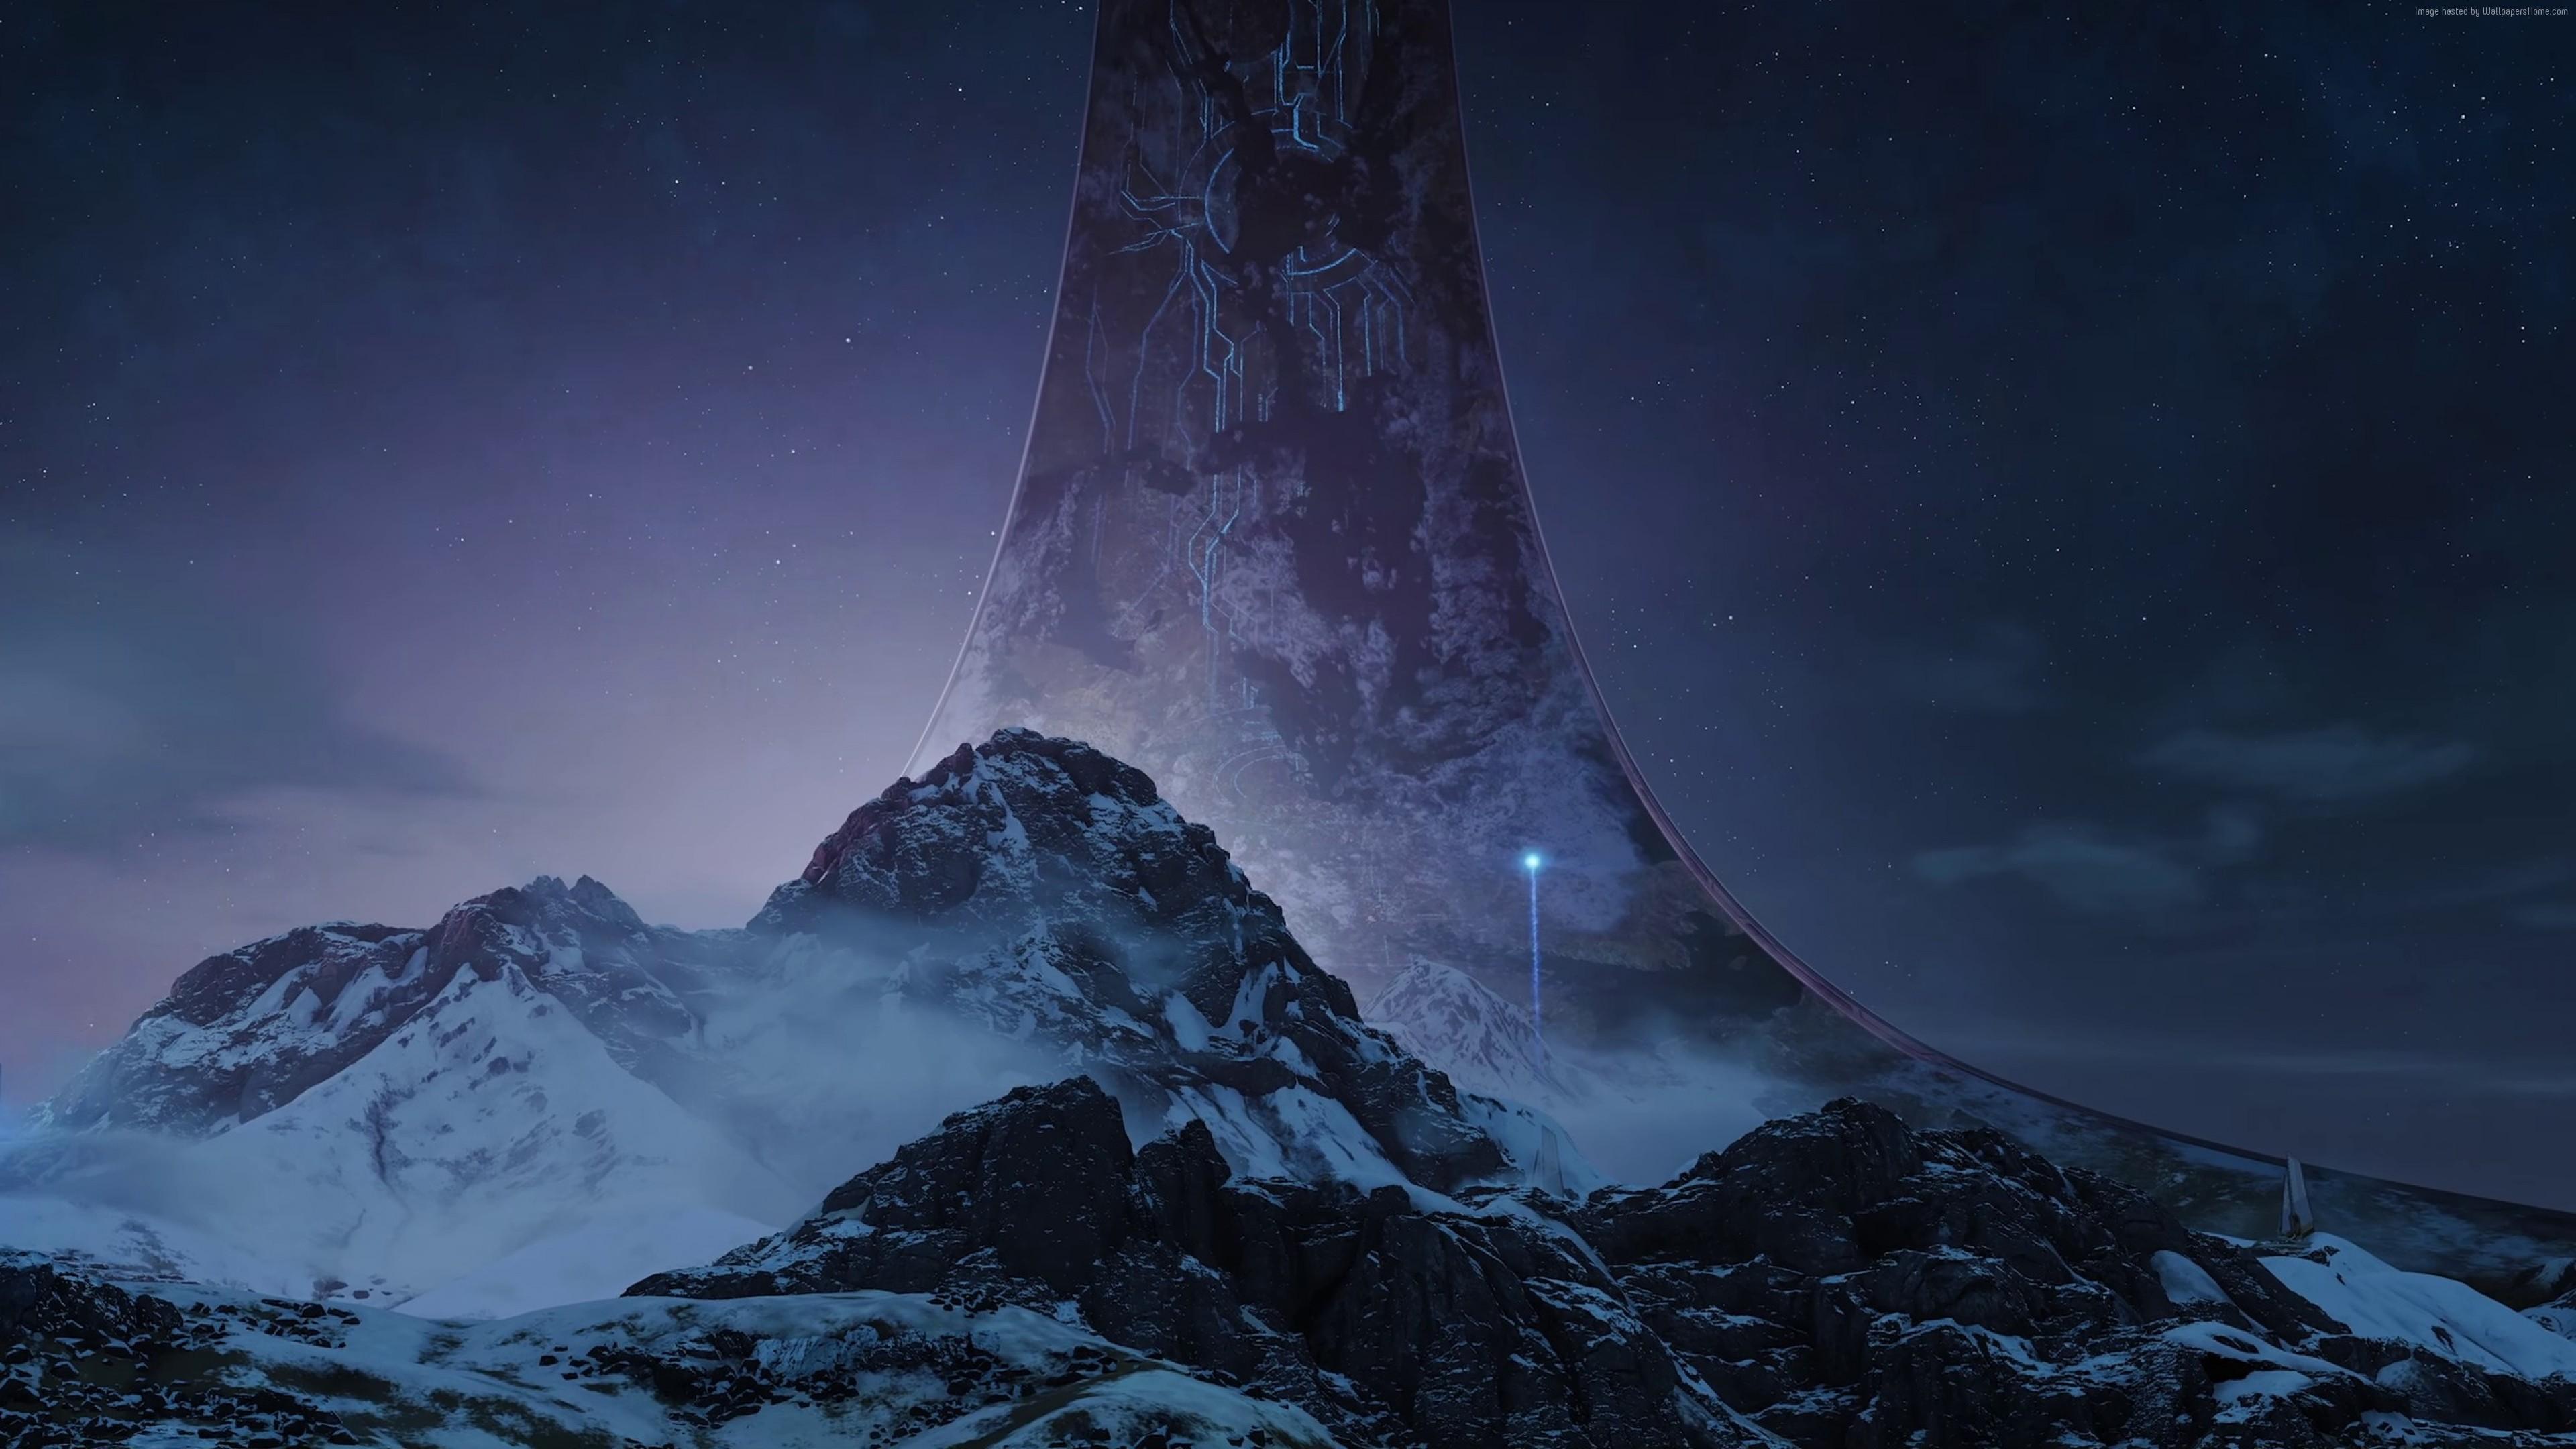 Wallpaper Halo Infinite, E3 2018, screenshot, 4K, Games ...